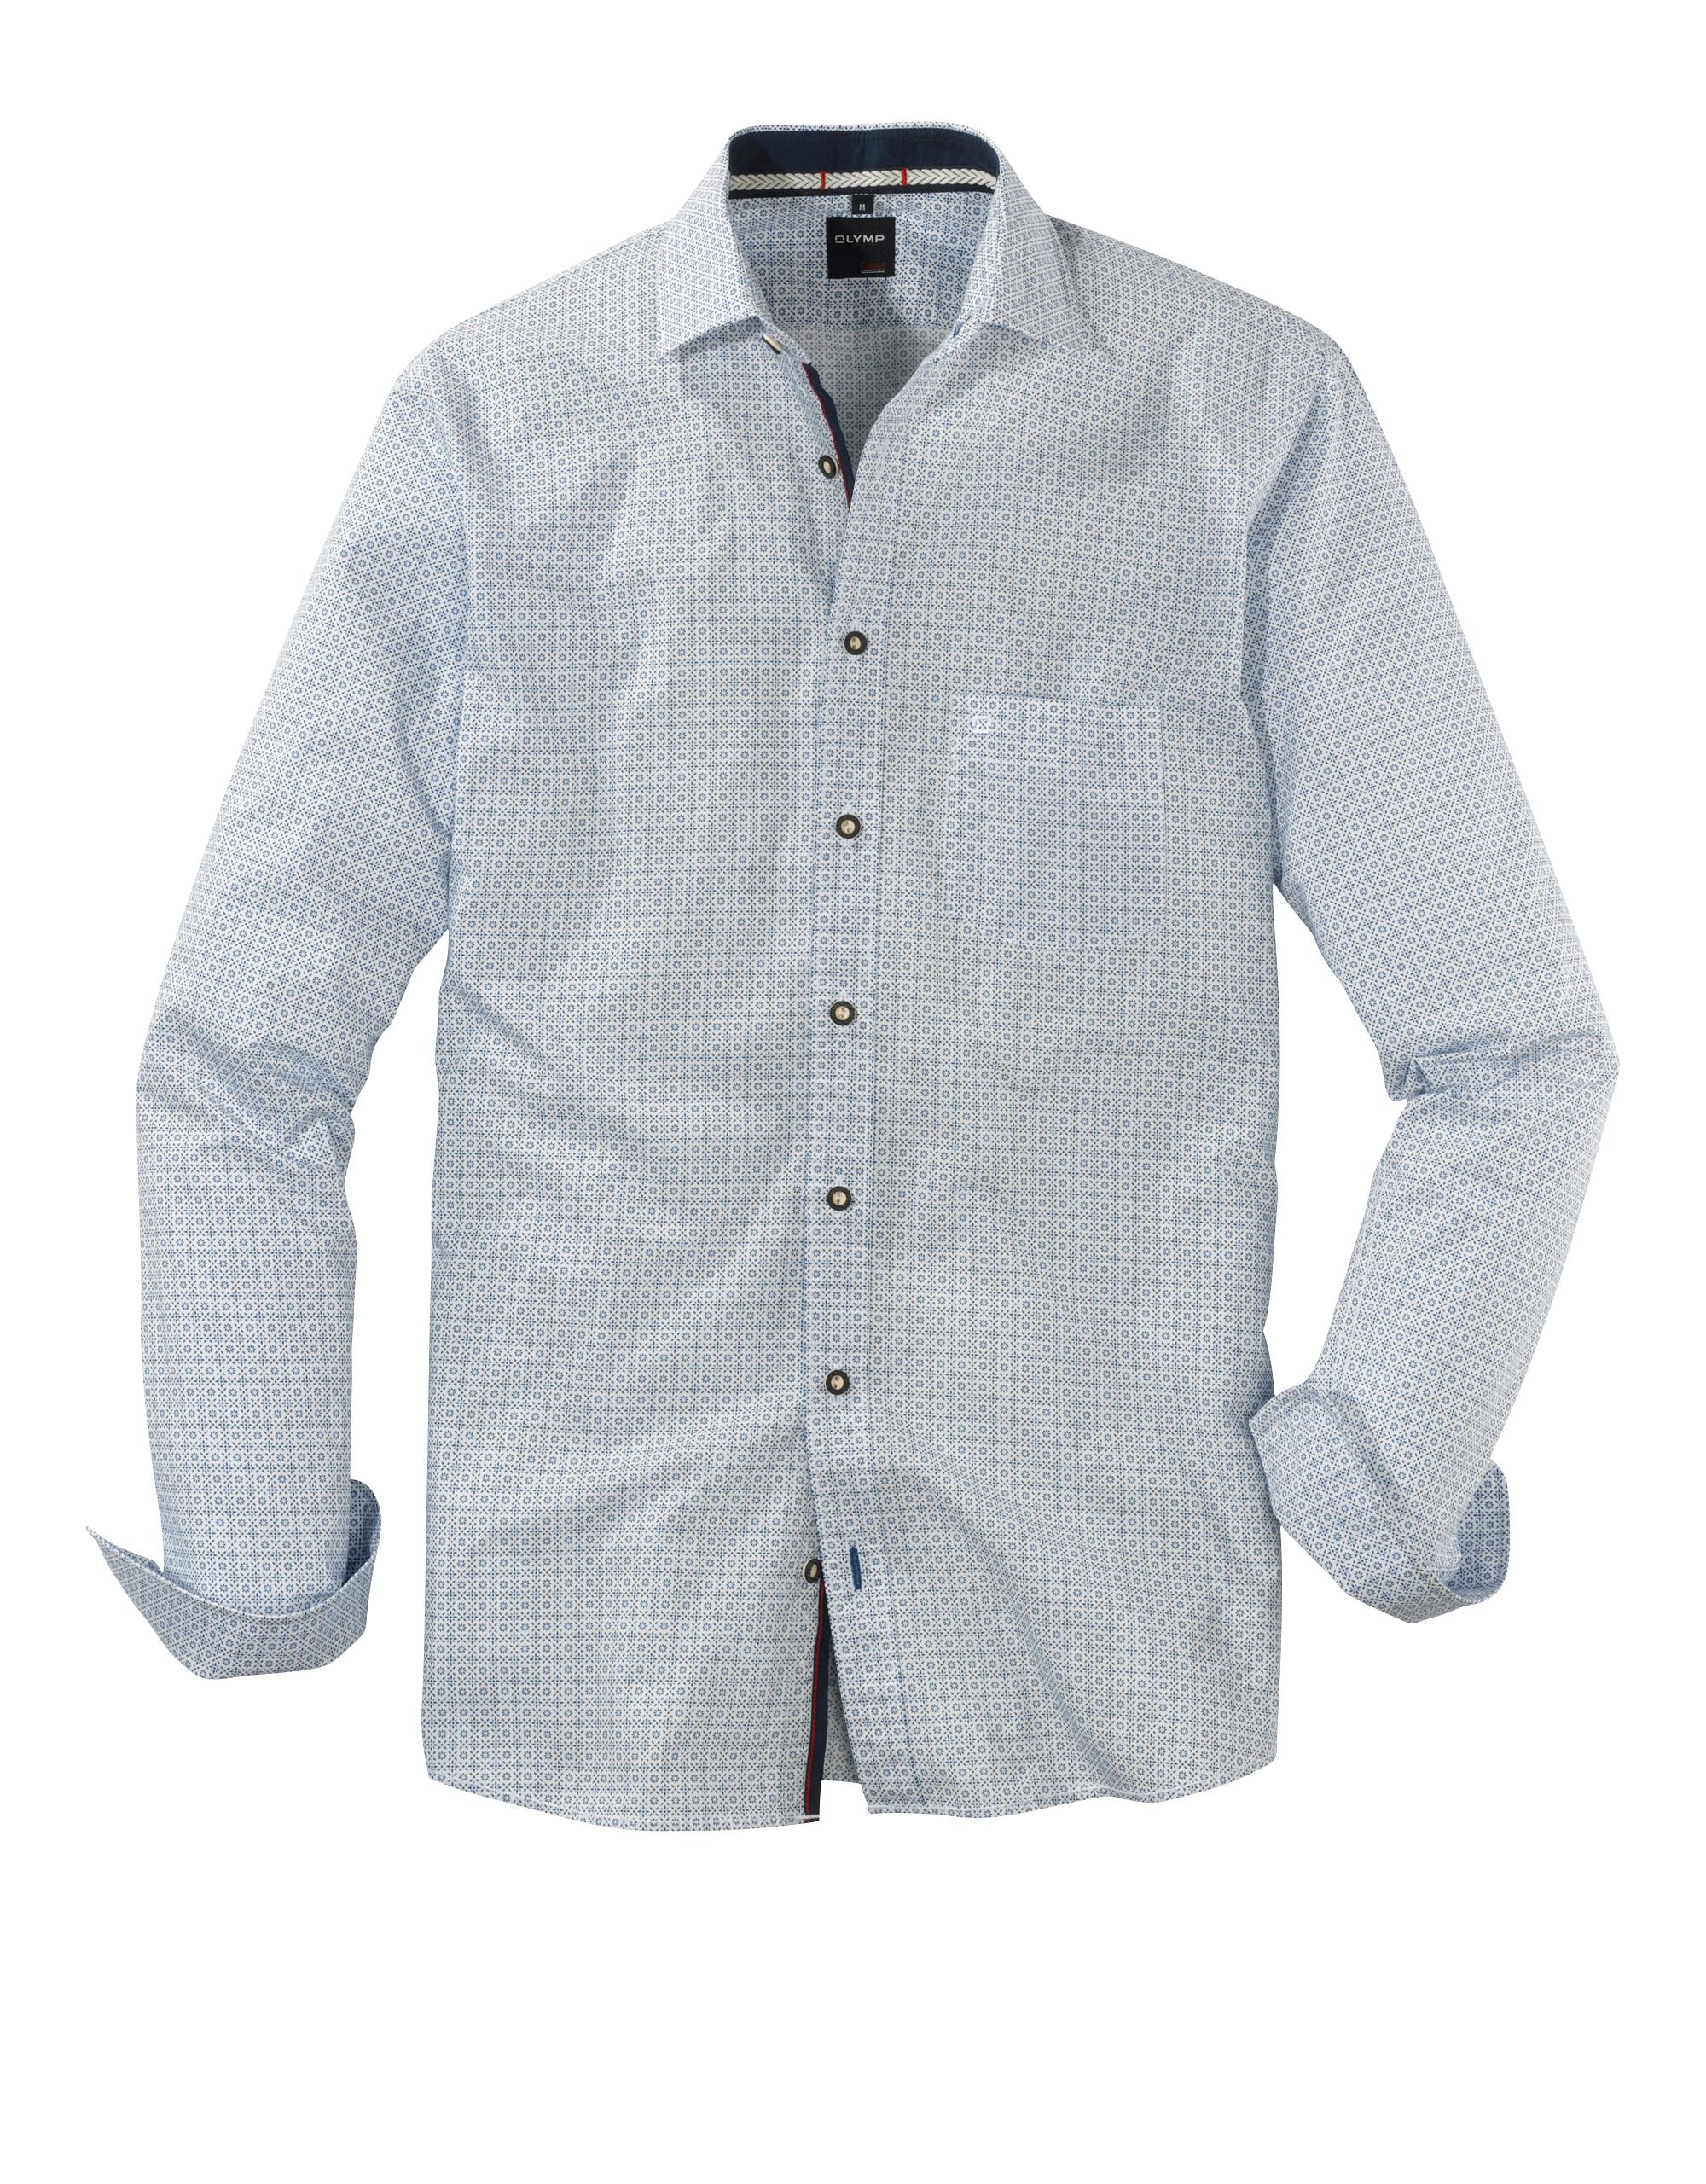 OLYMP Trachtenhemd, modern fit, Kent, Blau, M | Bekleidung > Hemden > Trachtenhemden | Blau | 100% baumwolle | OLYMP Trachtenhemd